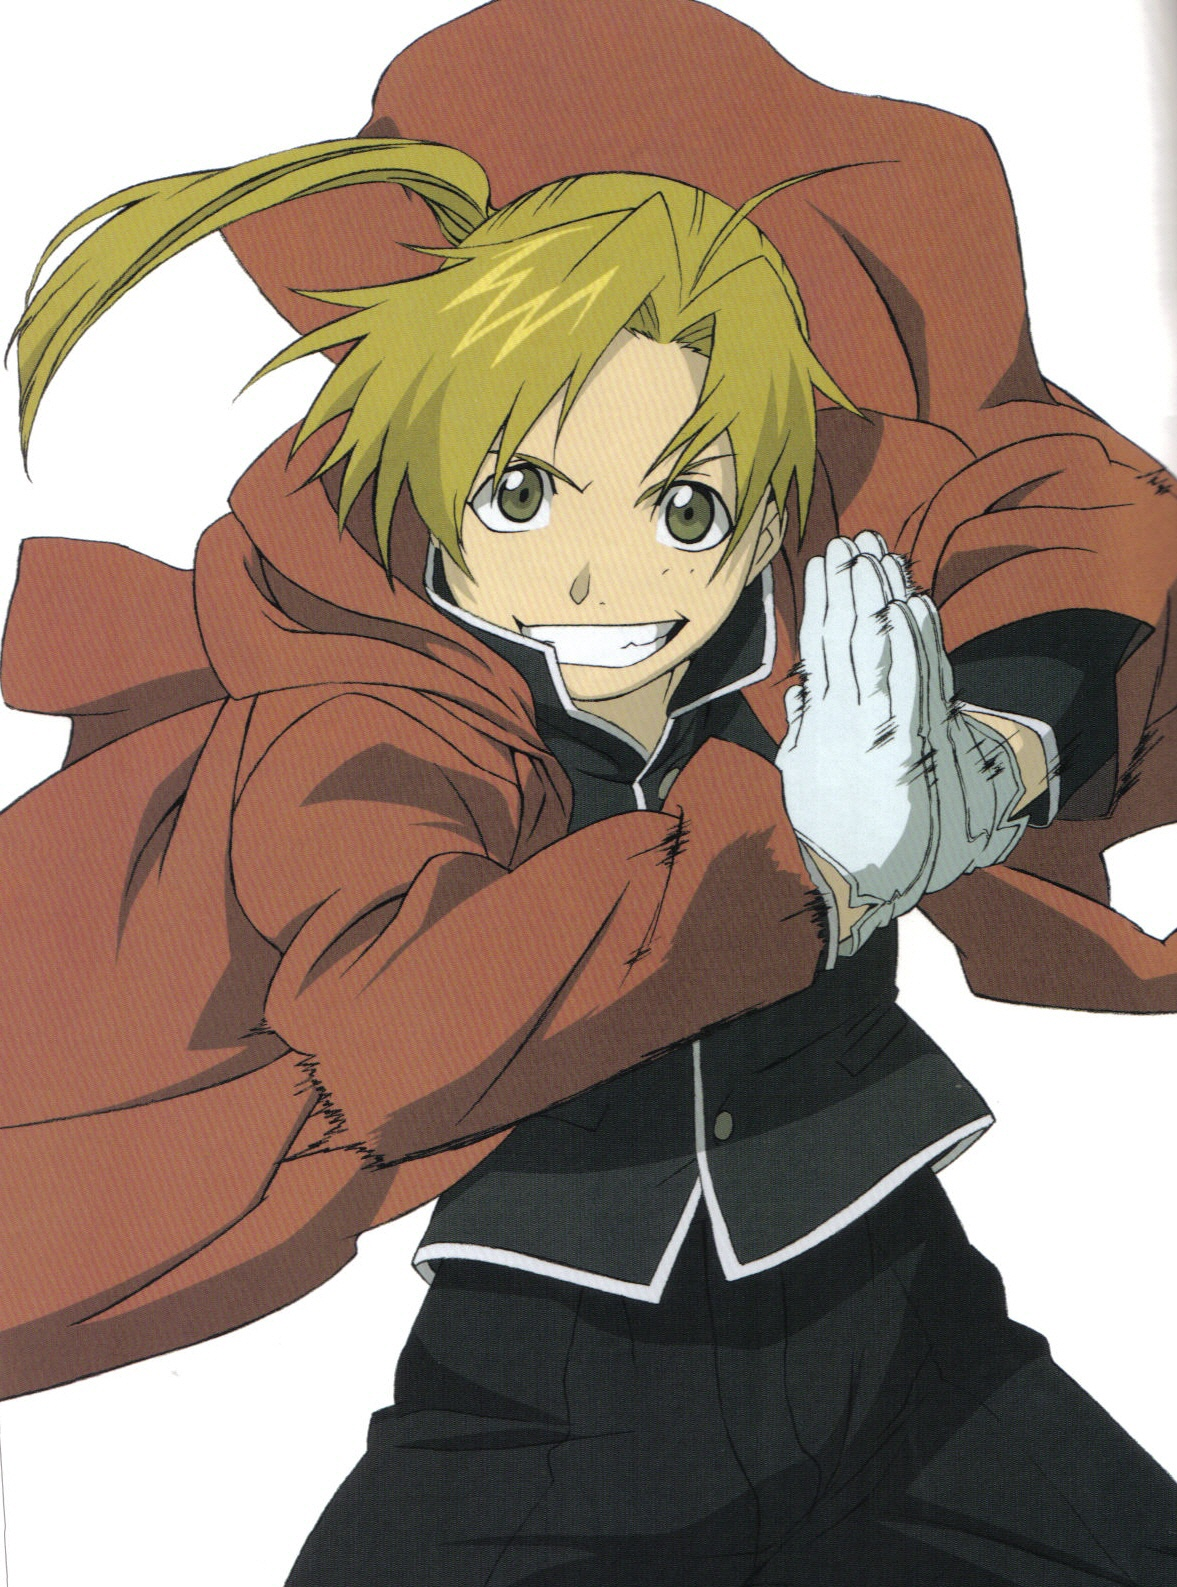 Al Elric alphonse elric, blonde hair | page 23 - zerochan anime image